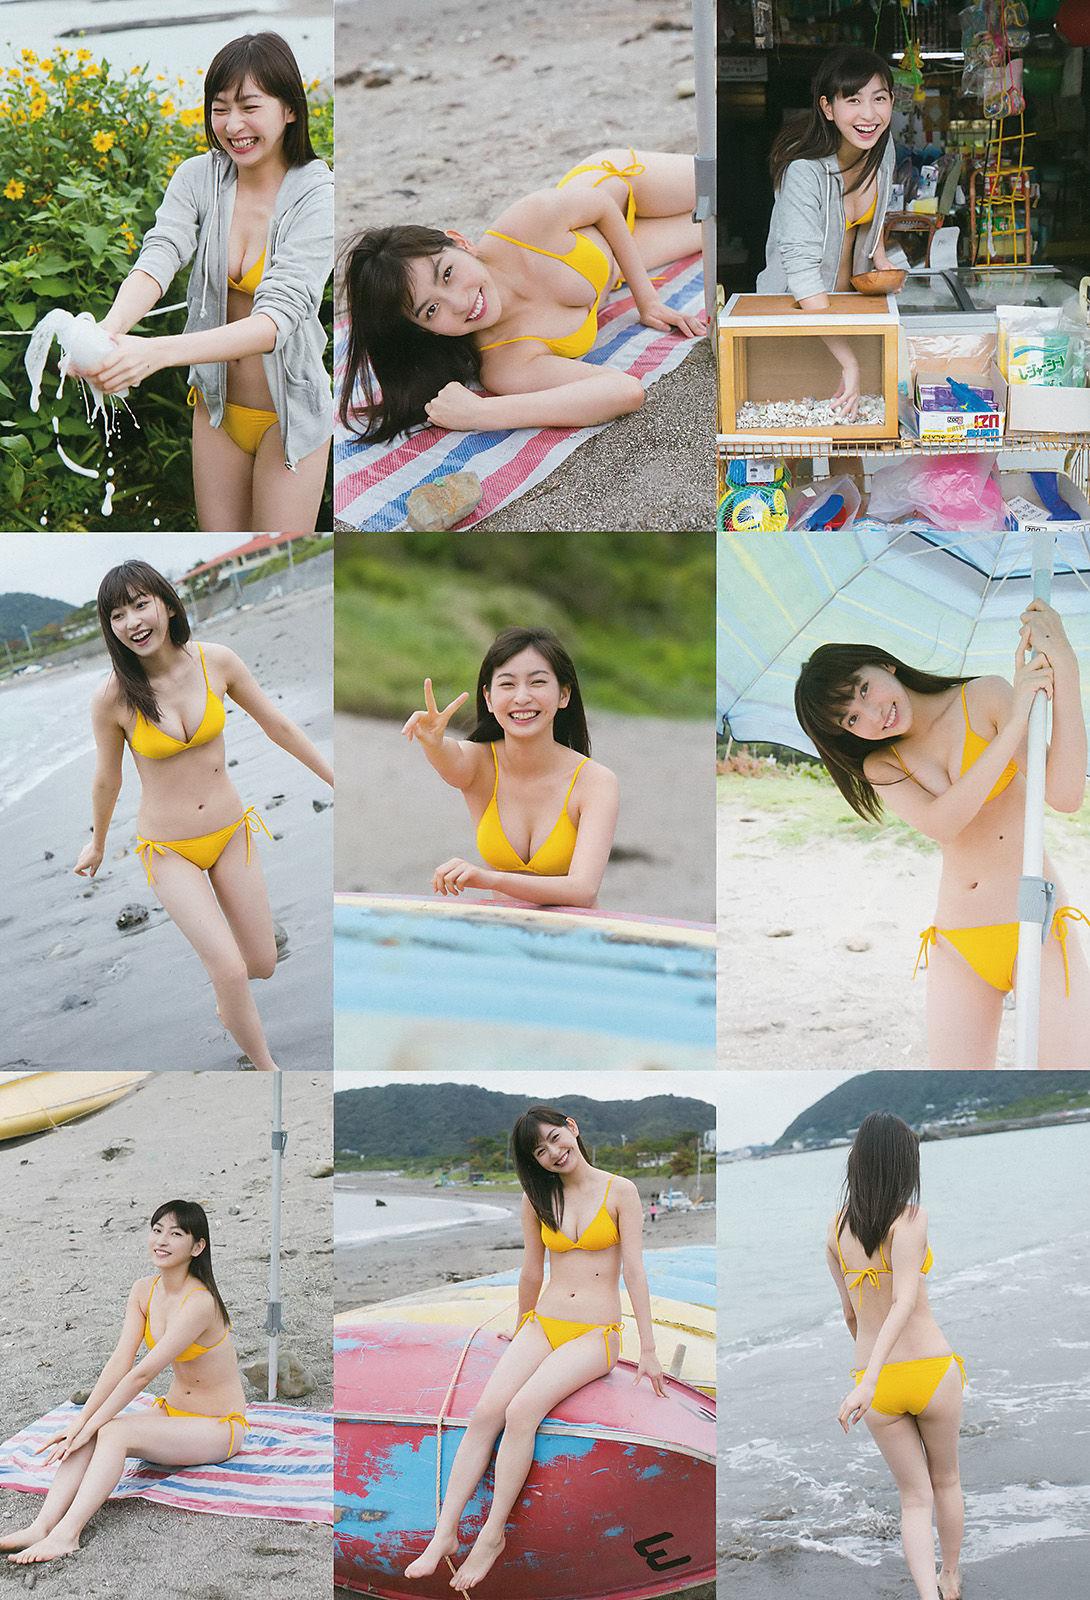 VOL.51 [Young Gangan]日本萌妹子:植村亚加莉超高清写真套图(37P)